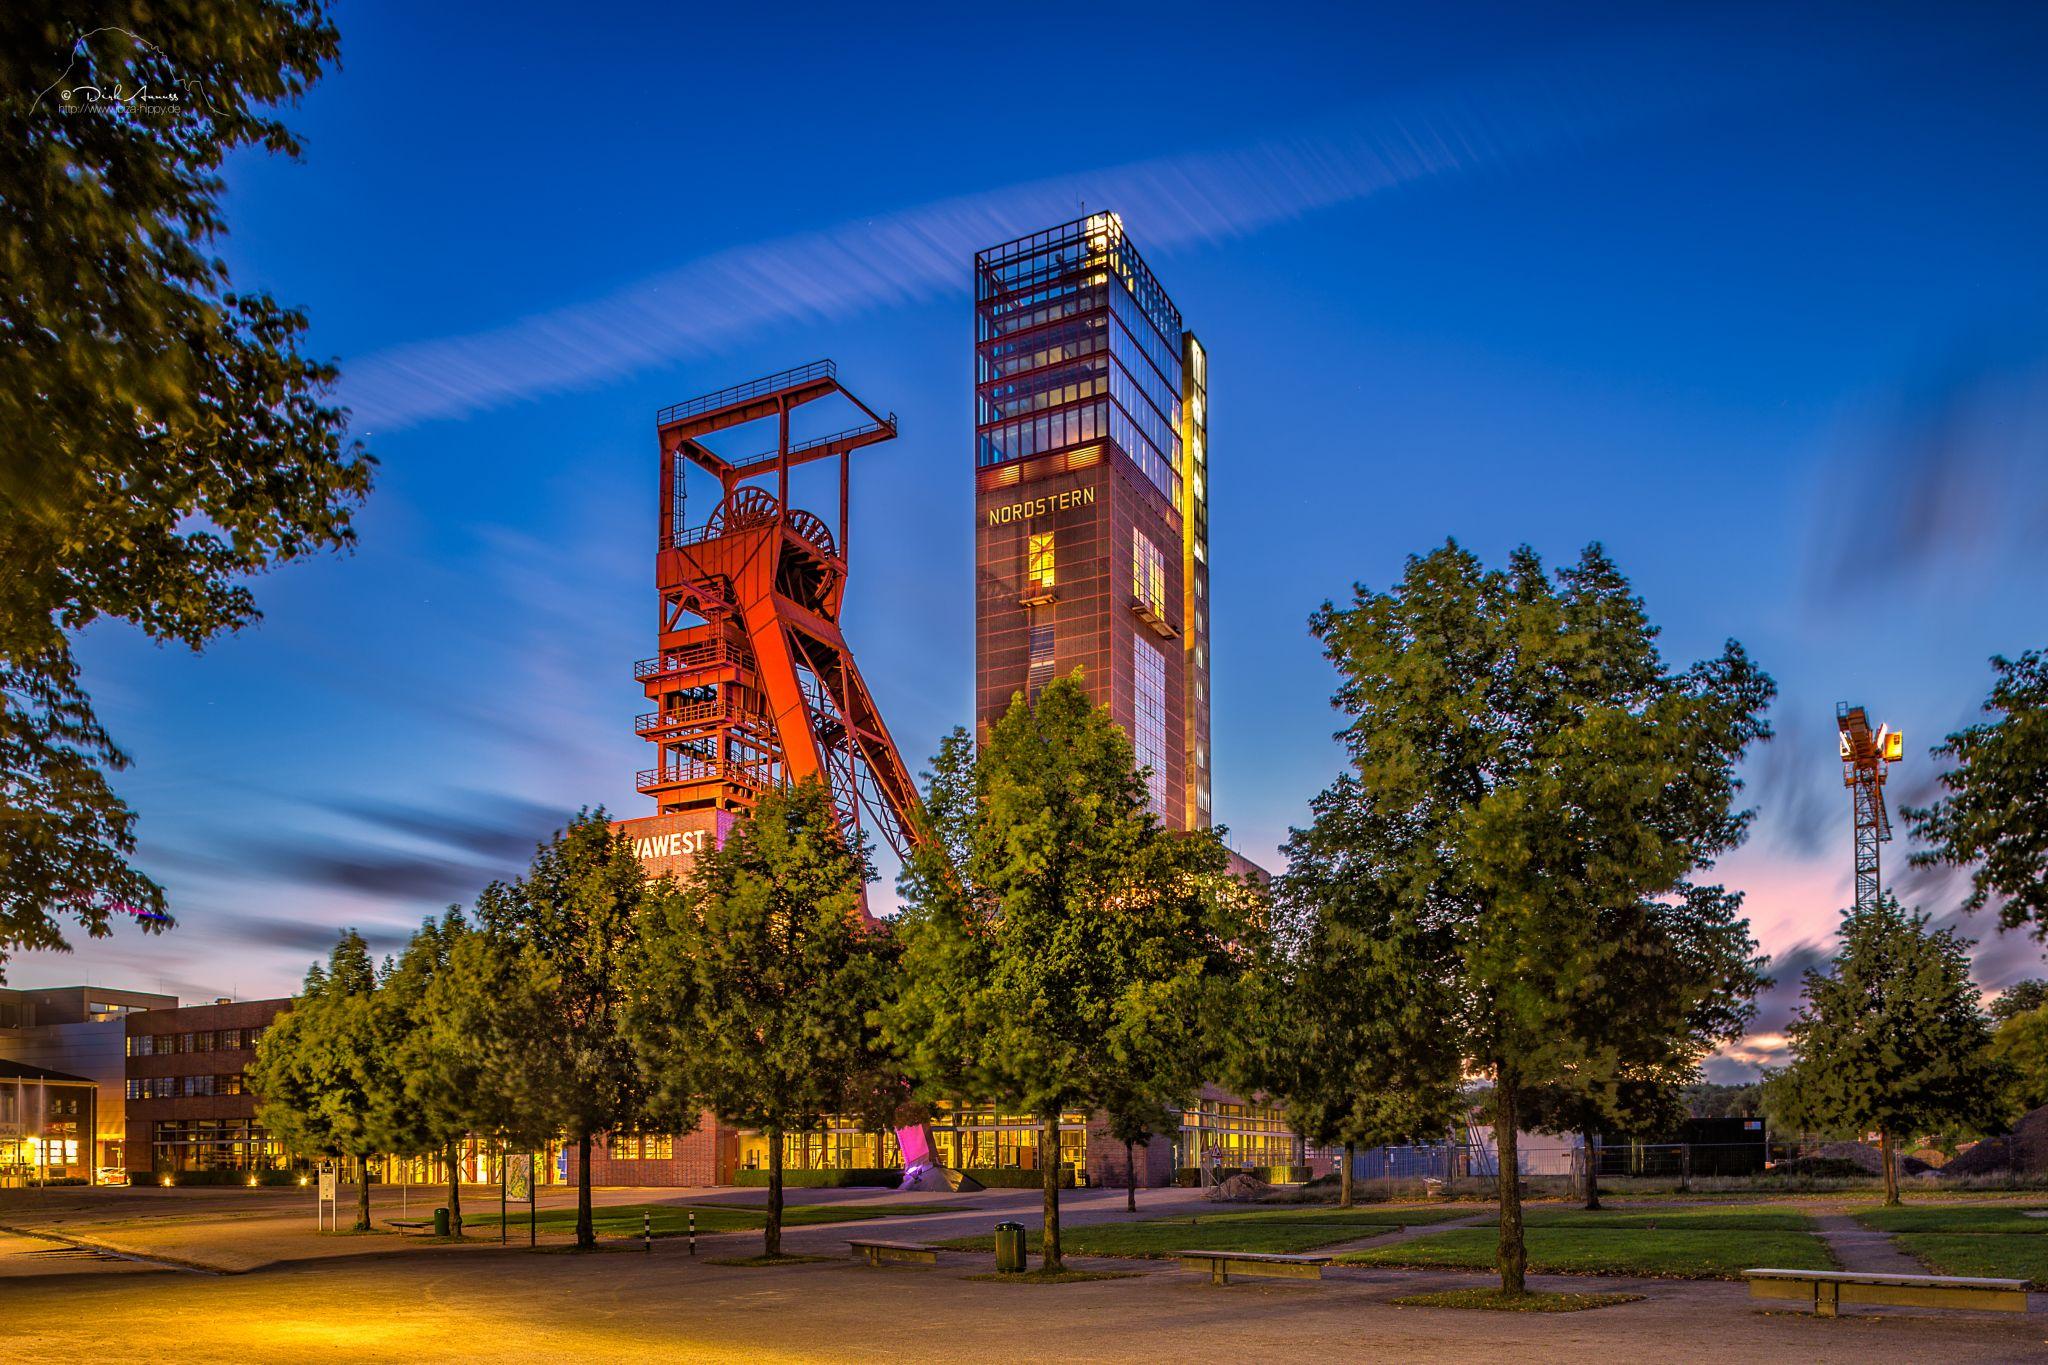 Blue Hour at former coalmine Nordstern, Germany